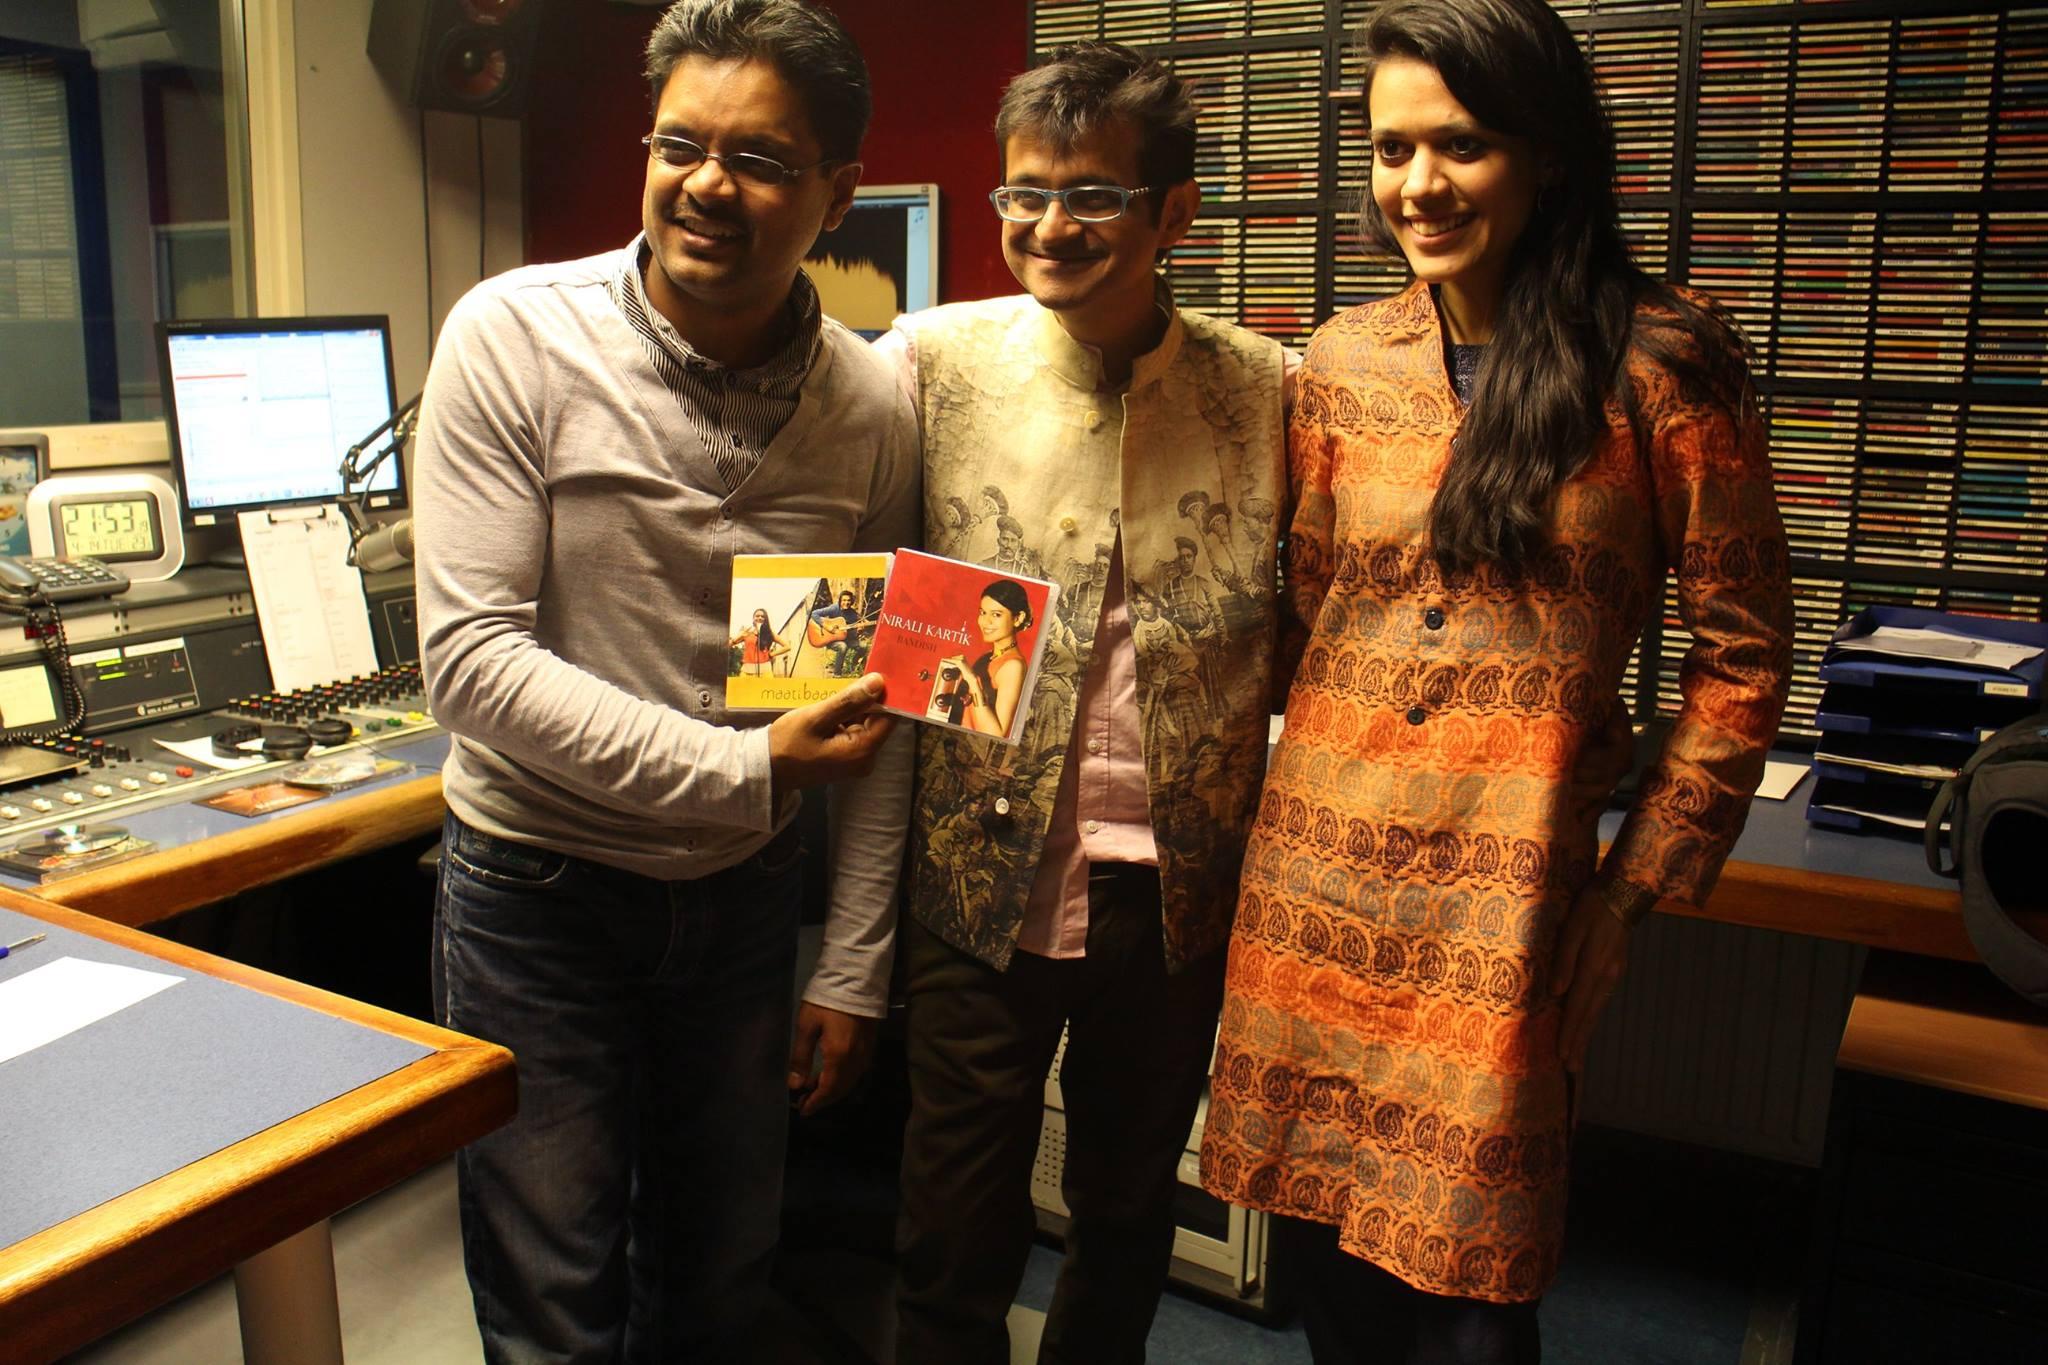 Radio_interview_AmorFM